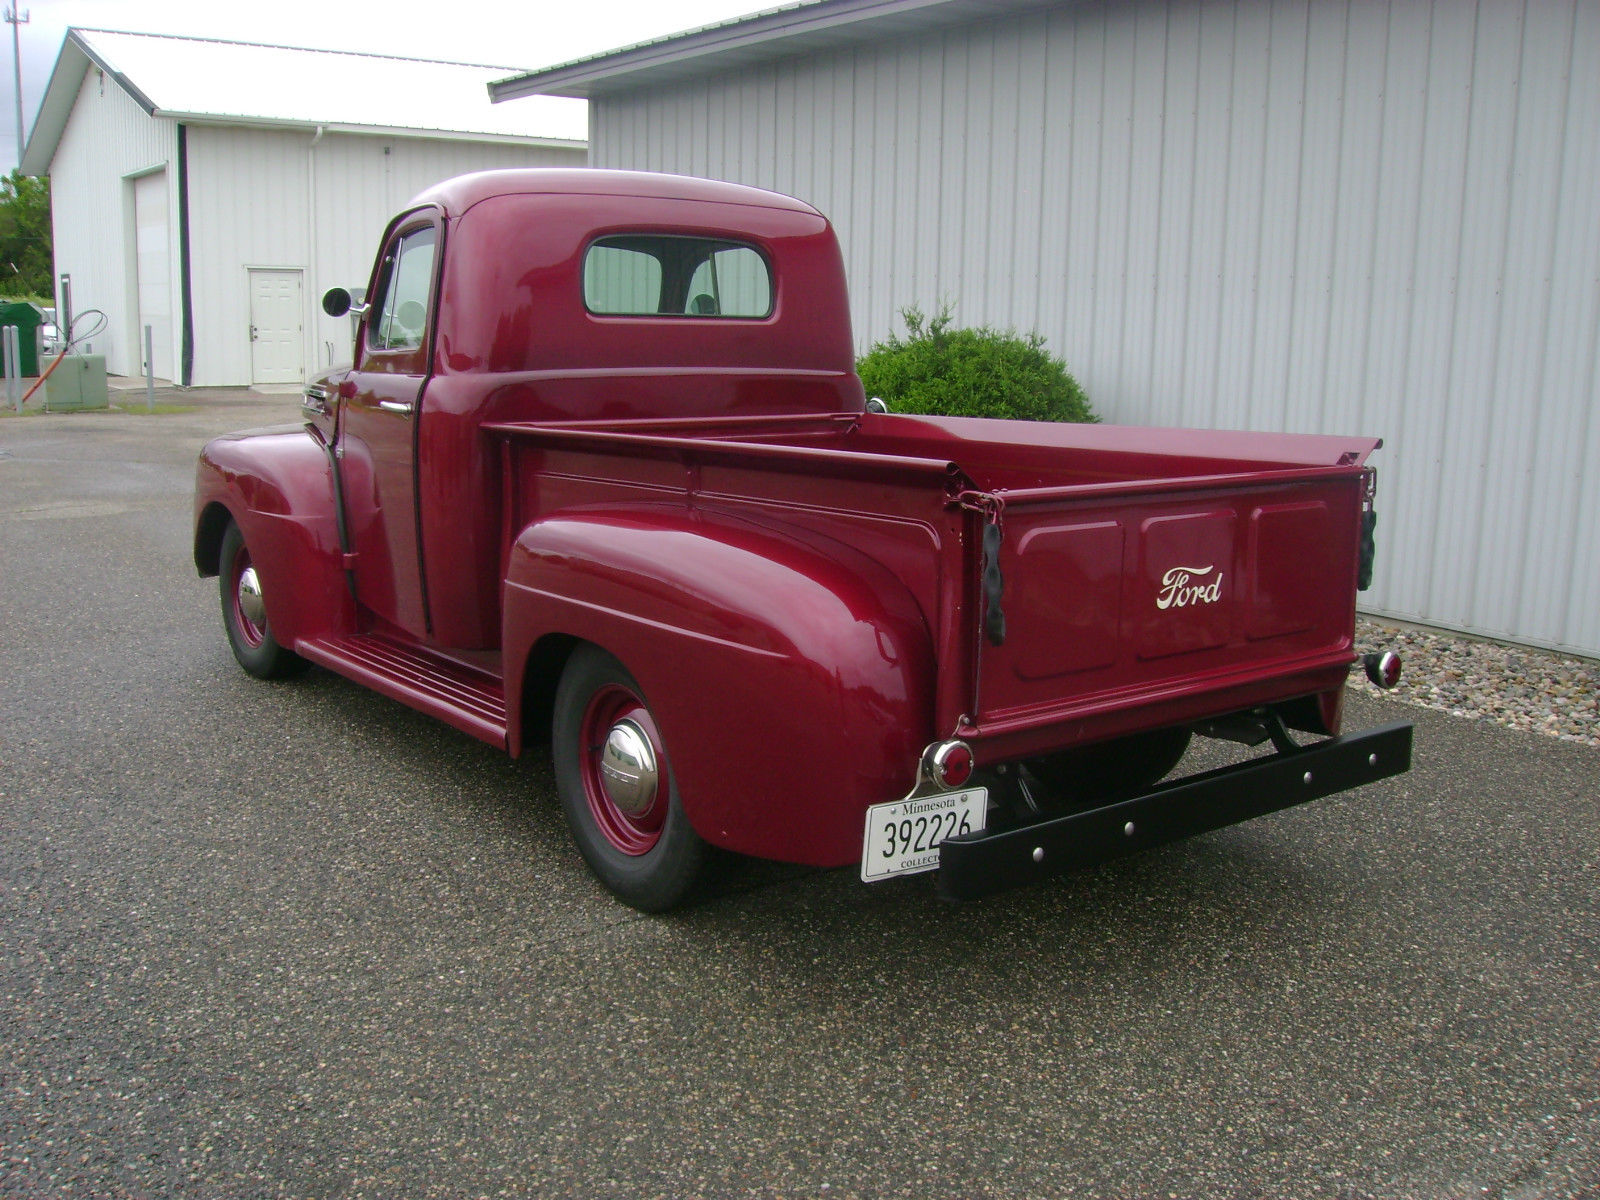 1950 ford f1 completely restored very sharp truck low reserve. Black Bedroom Furniture Sets. Home Design Ideas